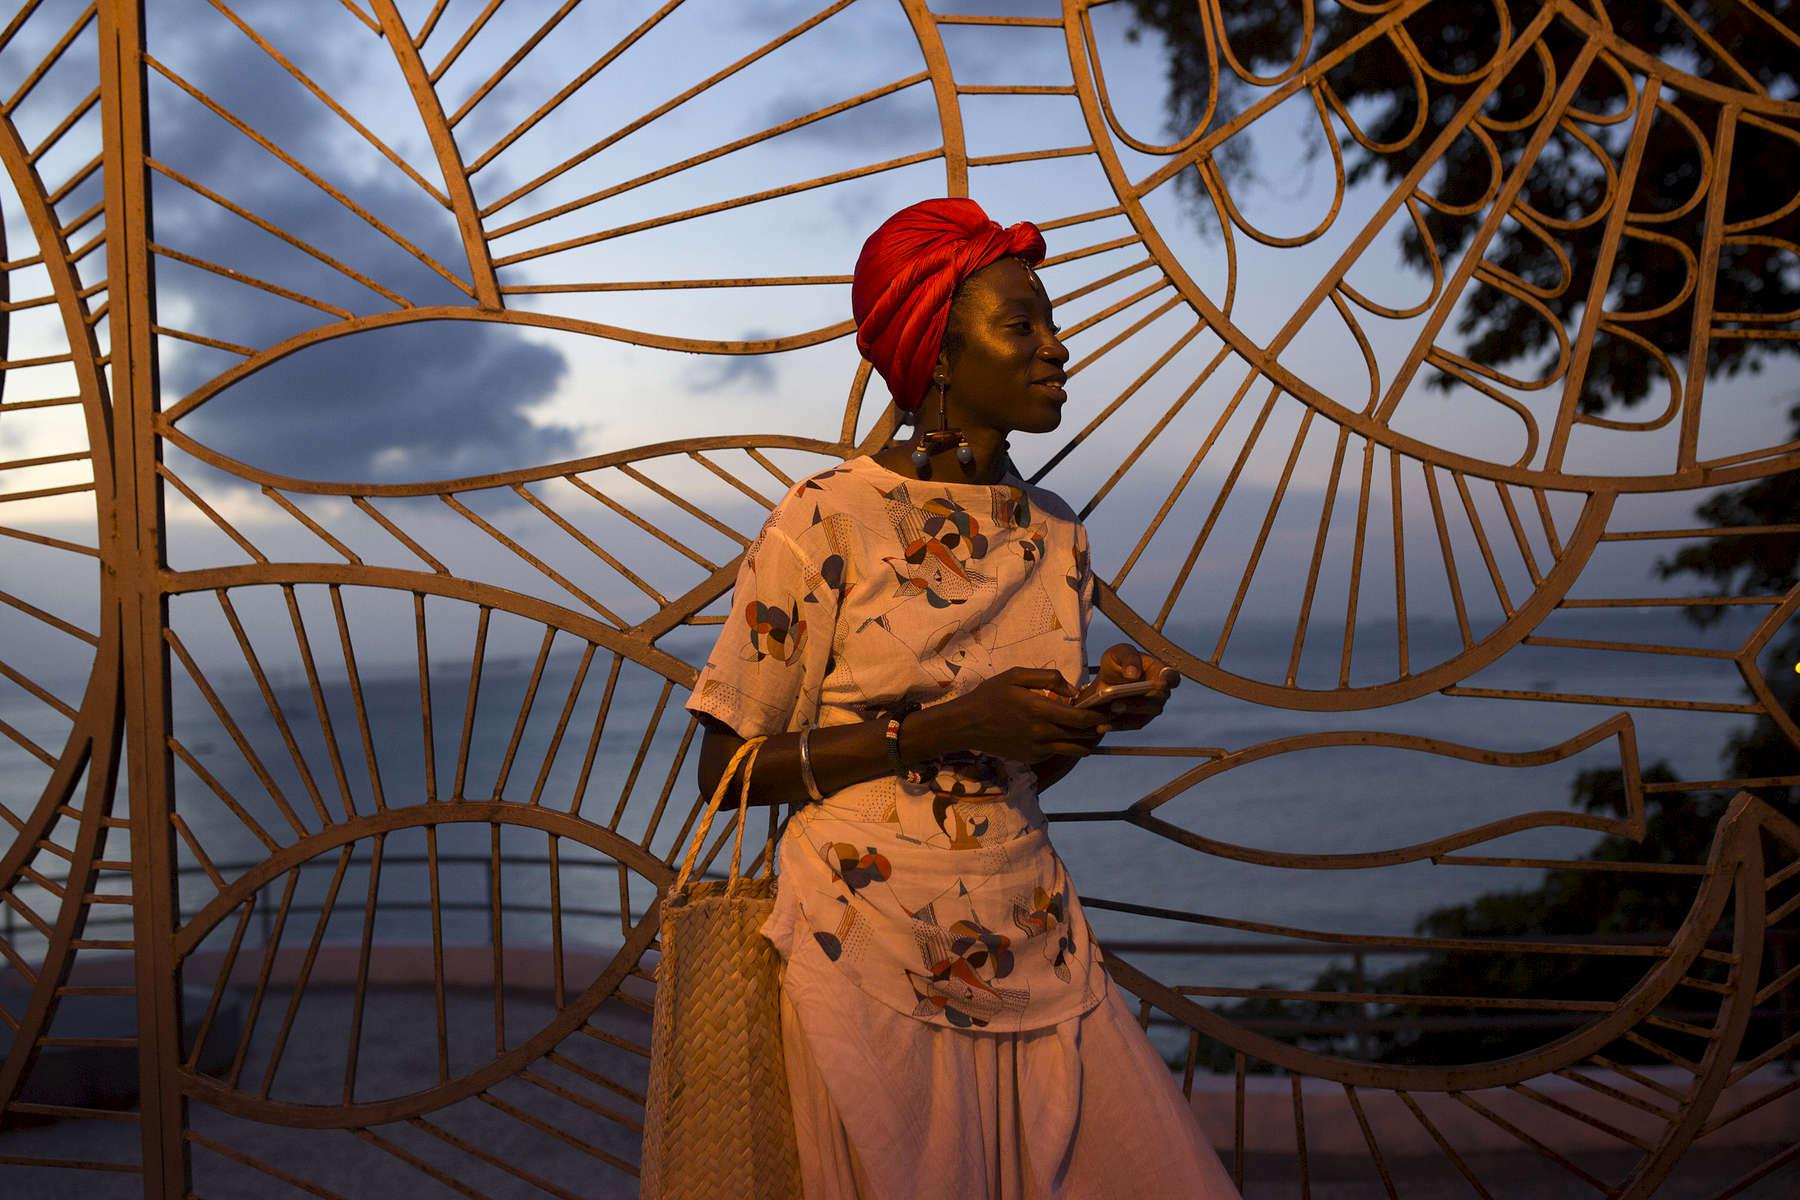 Luma Nascimento waits for an Uber outside Salvador's Museum of Modern Art. Luma is an artist and writer who dedicates who work to empowering Afro-Brazilian women.